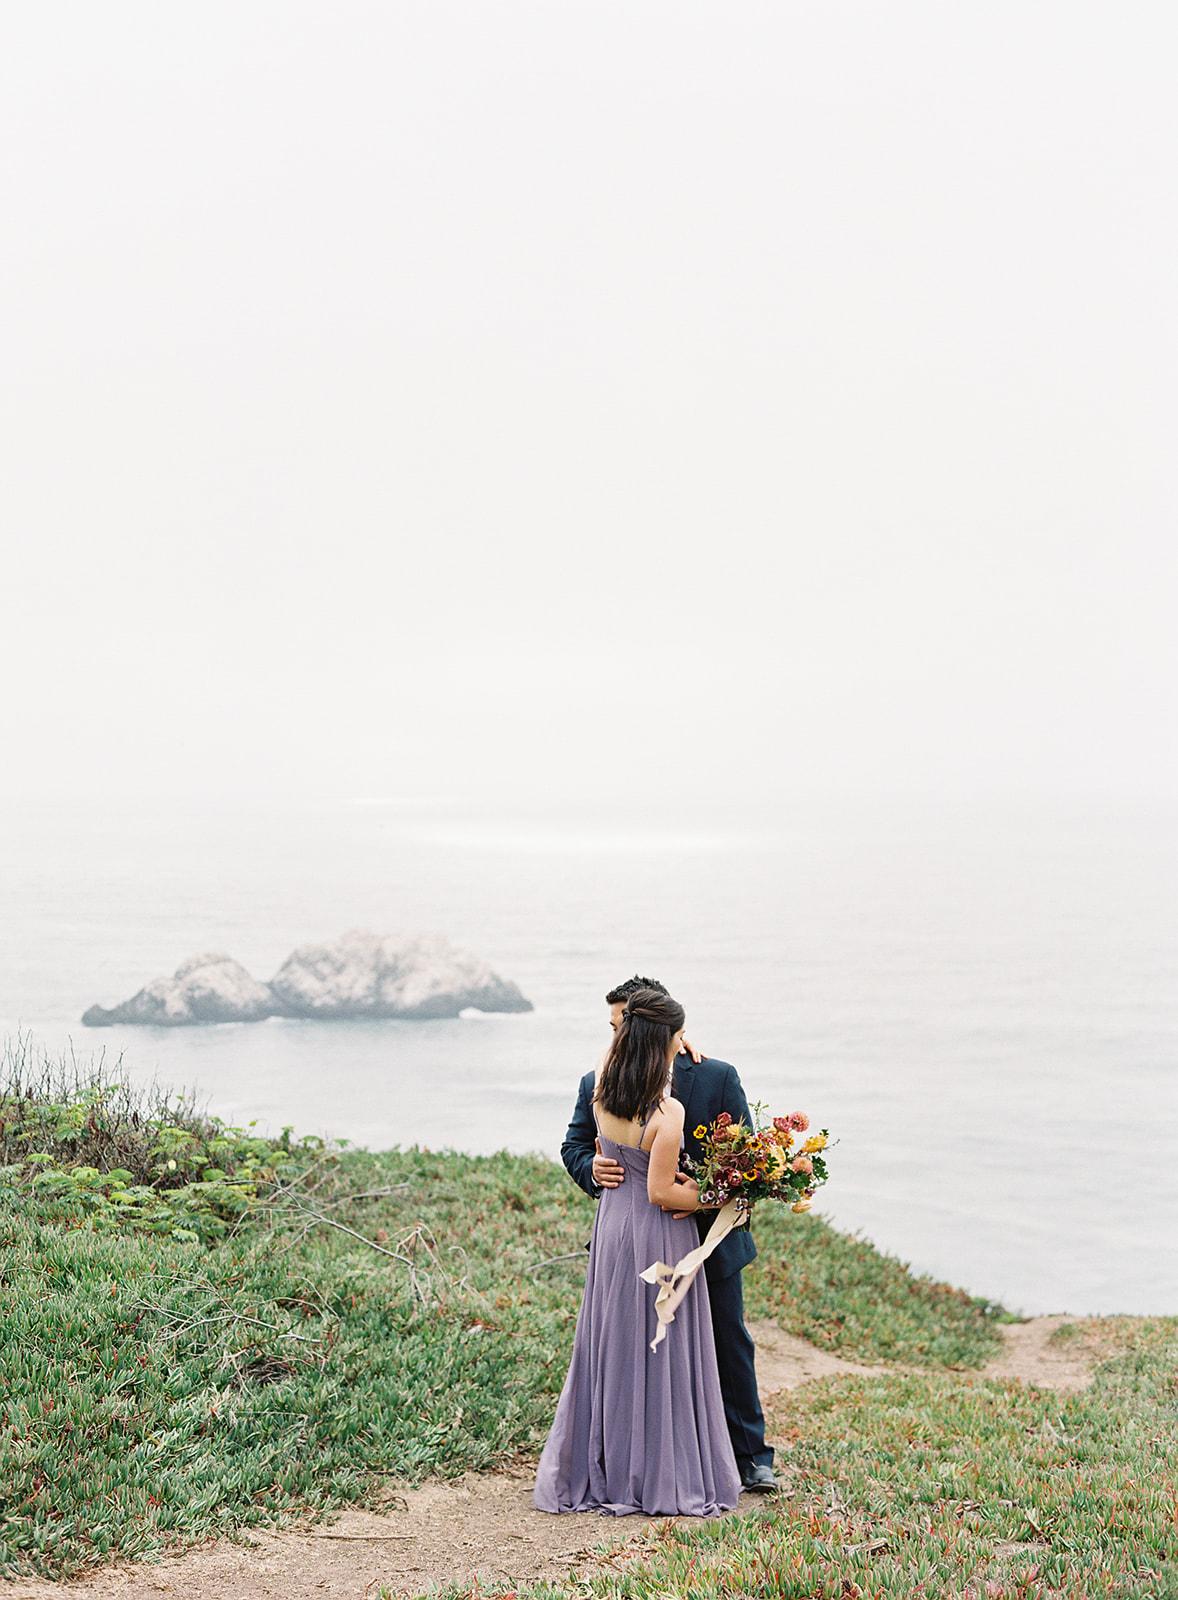 Nathalie_Cheng_Photography_Anniversary_Frances___Patrick_135.jpg